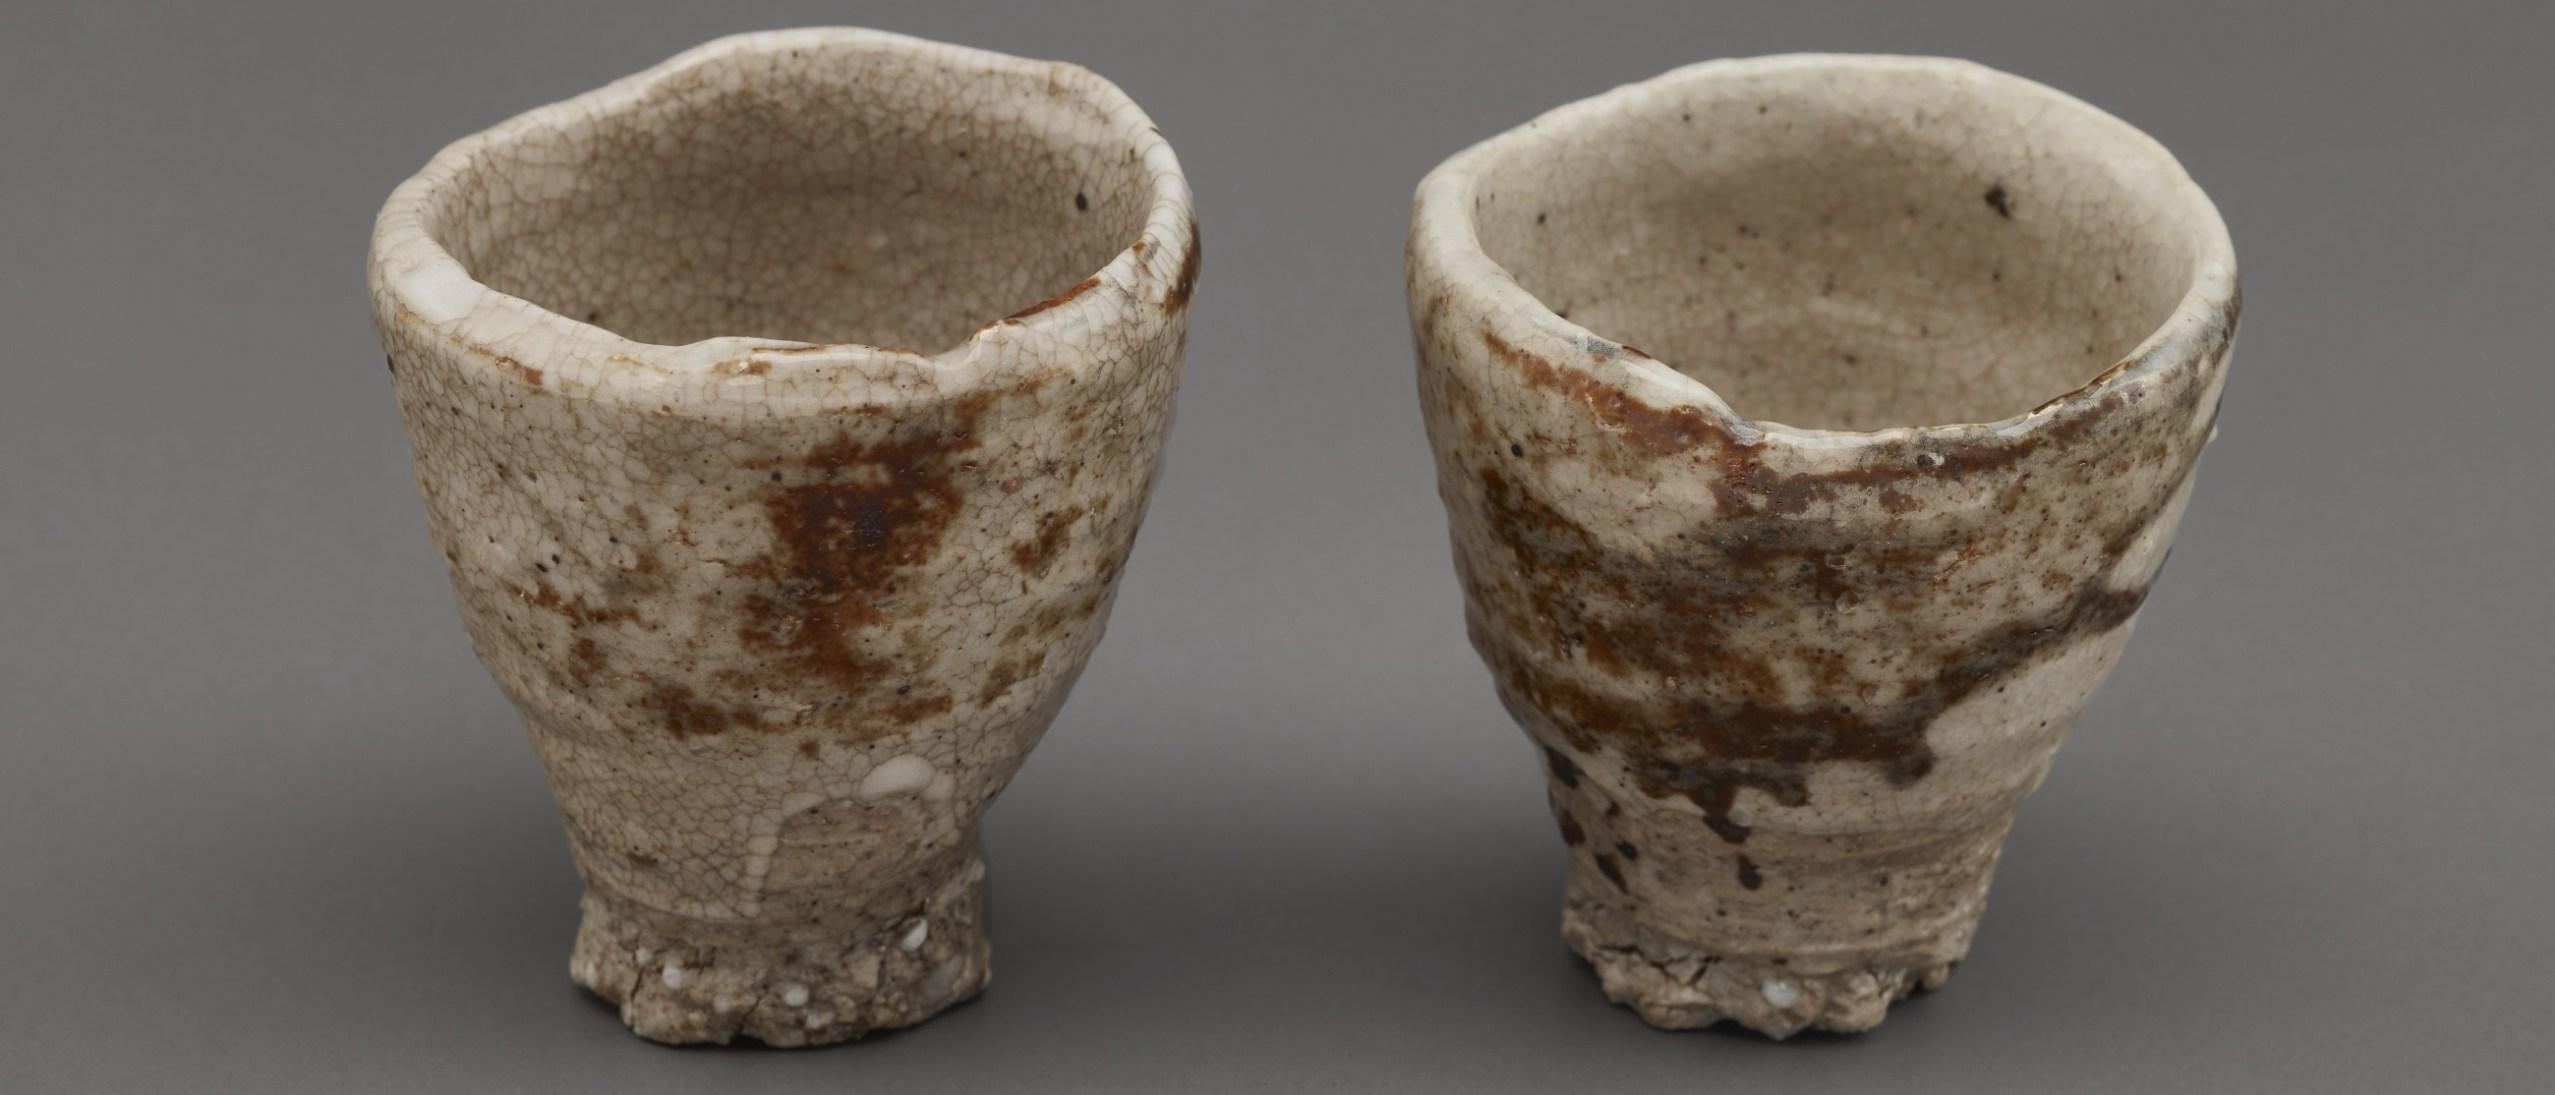 Photo of Two sake cups; Akiyama Yō (b. 1953); Japan, Kyoto, 1992; Porcelain with iron pigment under feldspathic glaze; Gift of Halsey and Alice North; Arthur M. Sackler Gallery S2017.17.1–2